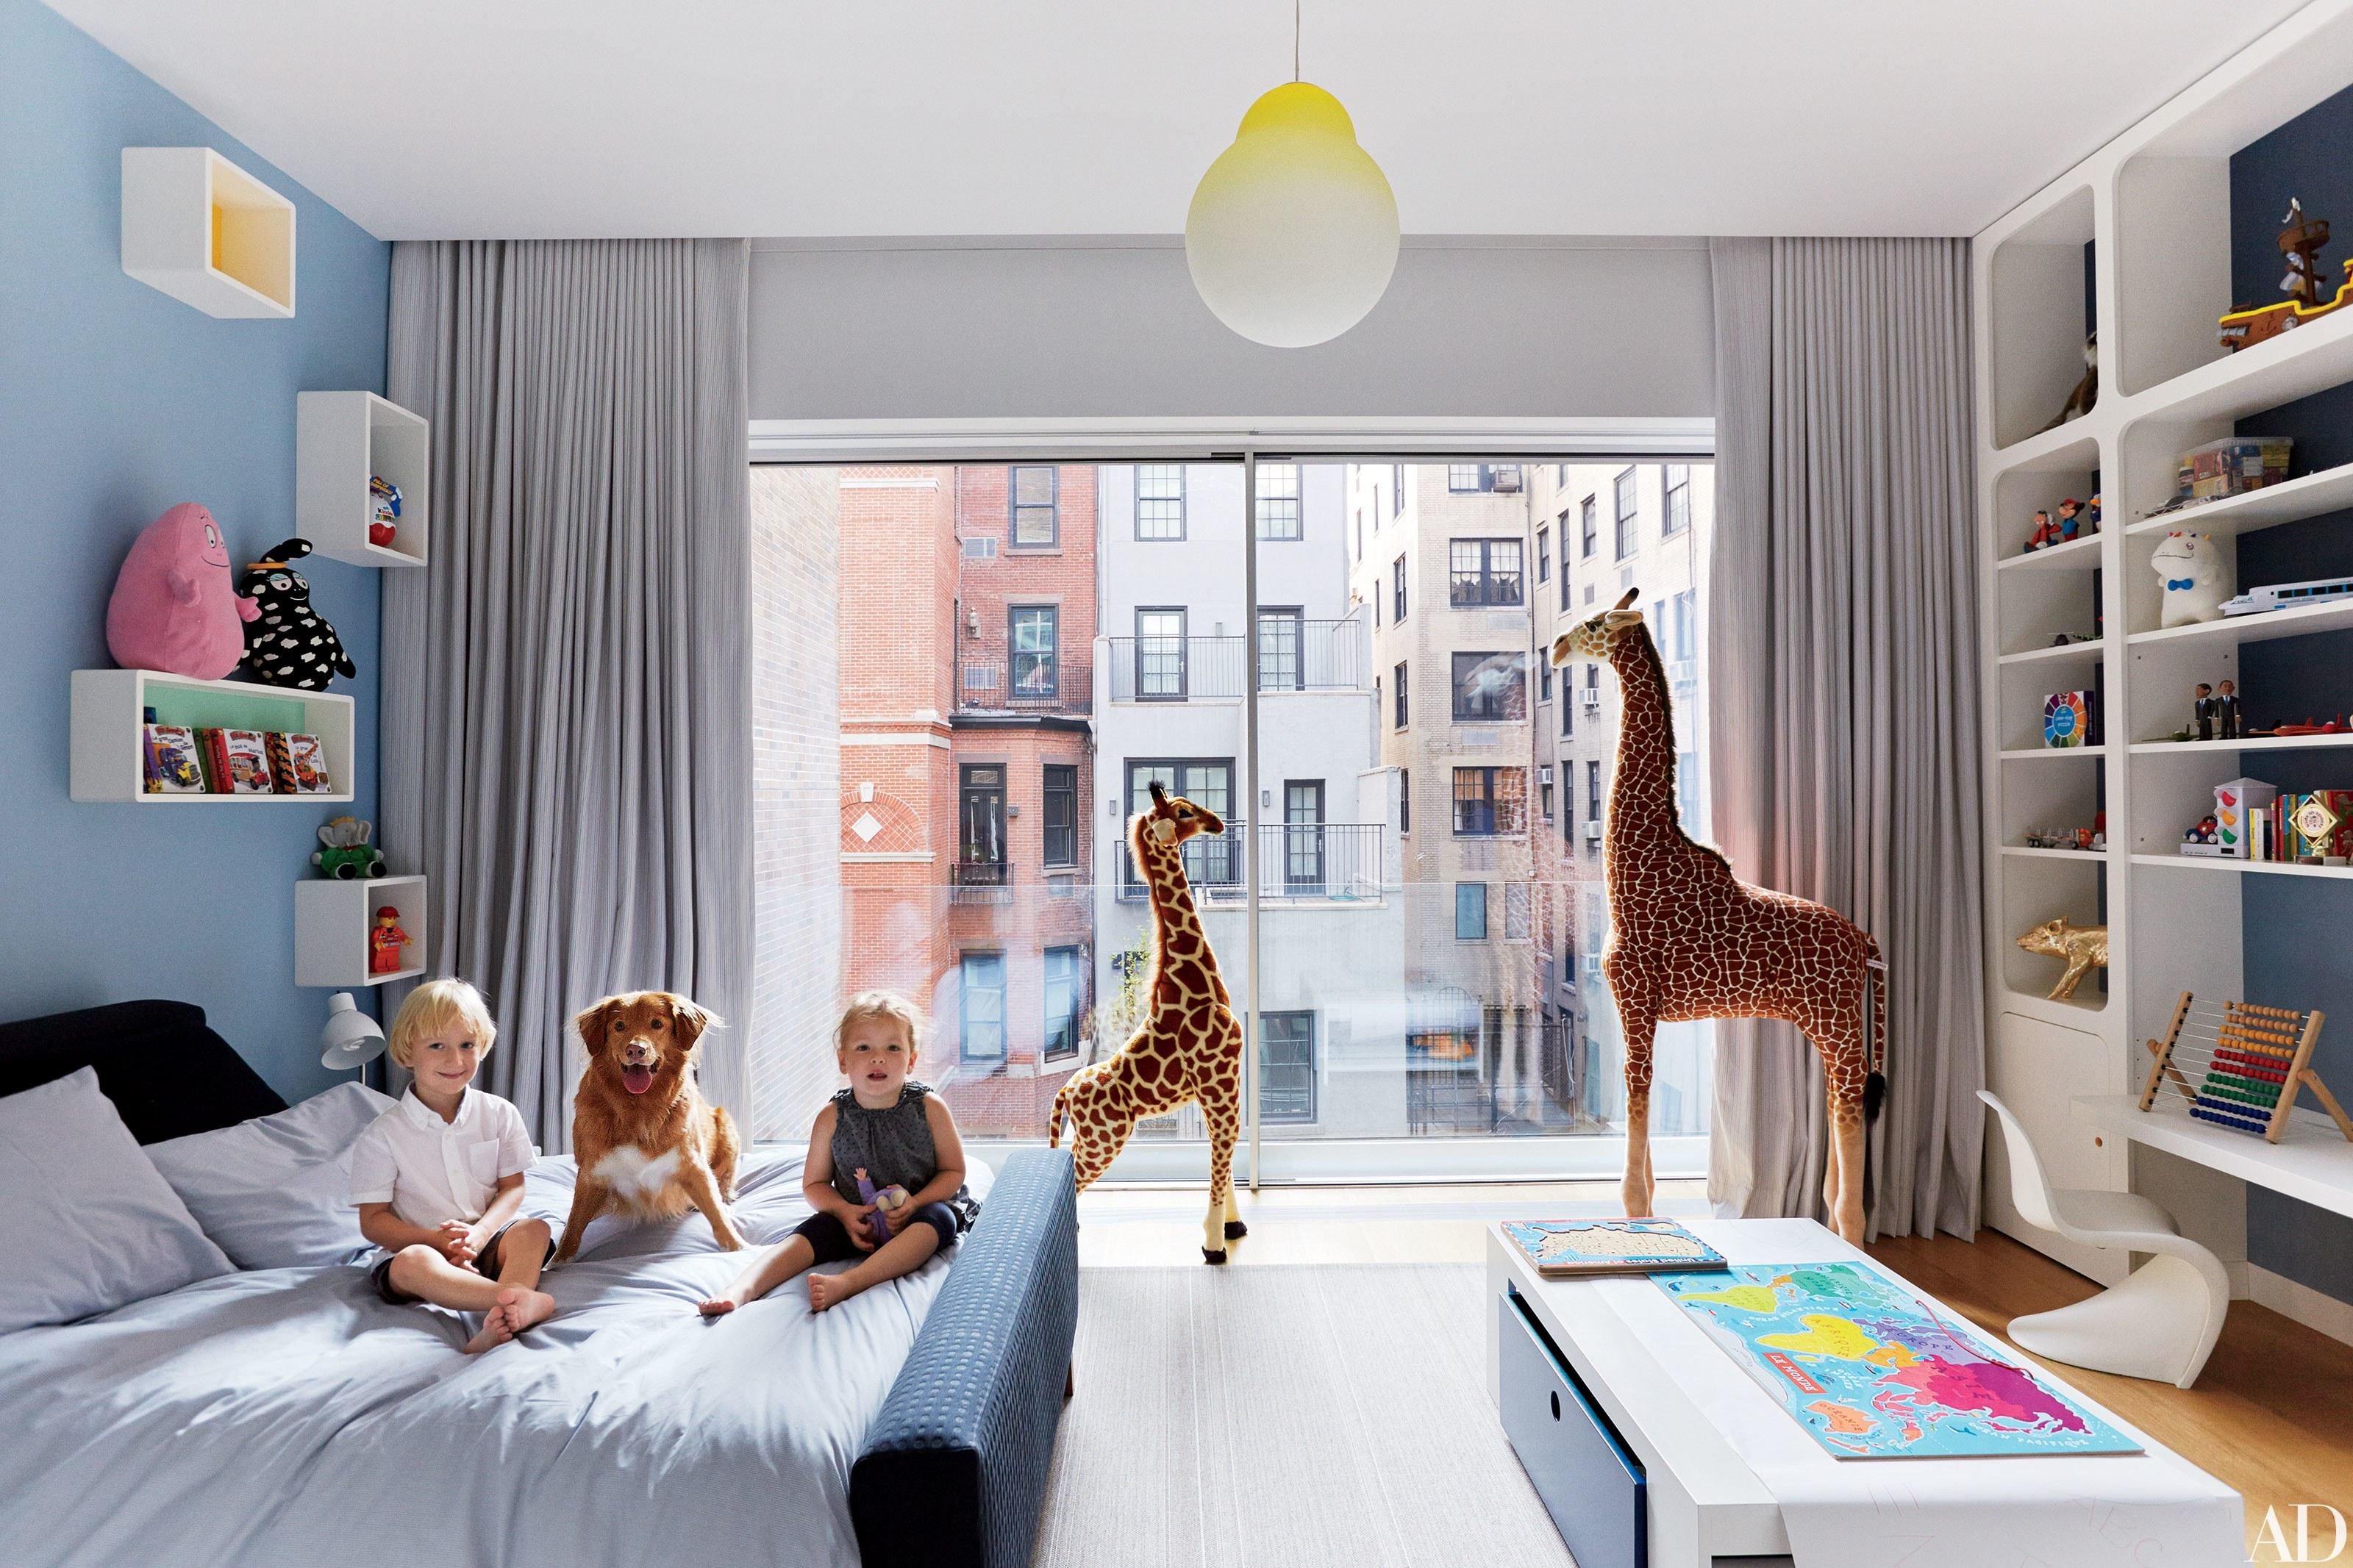 54 Stylish Nursery & Nursery Ideas Photos |  Architecture overview DCKOREN